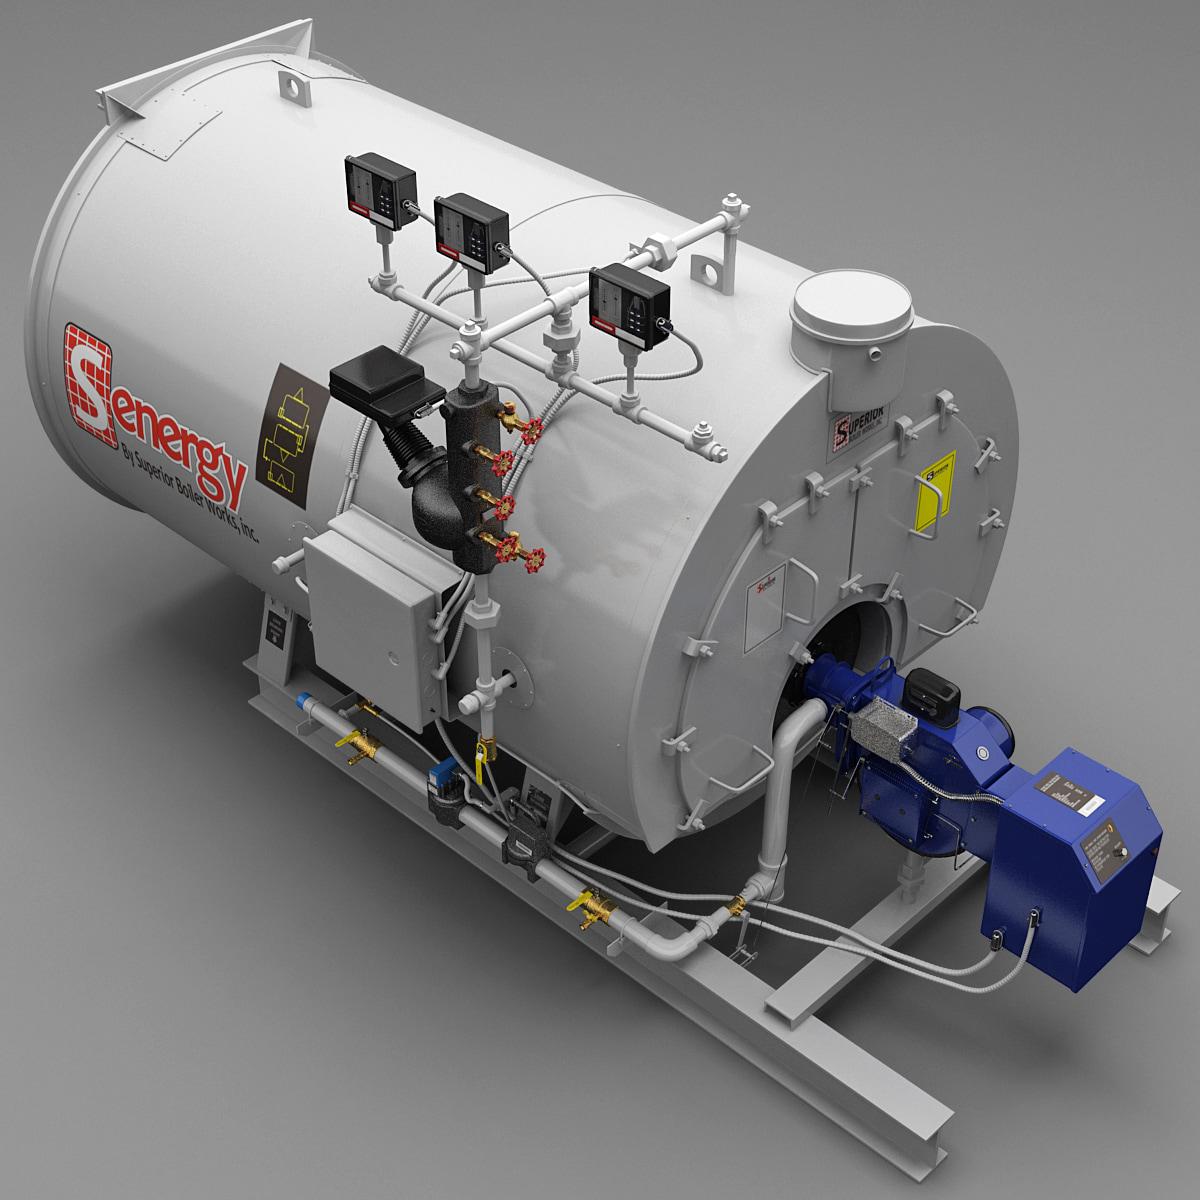 Industrial_Boiler_Senergy_40_HP_0001.jpg